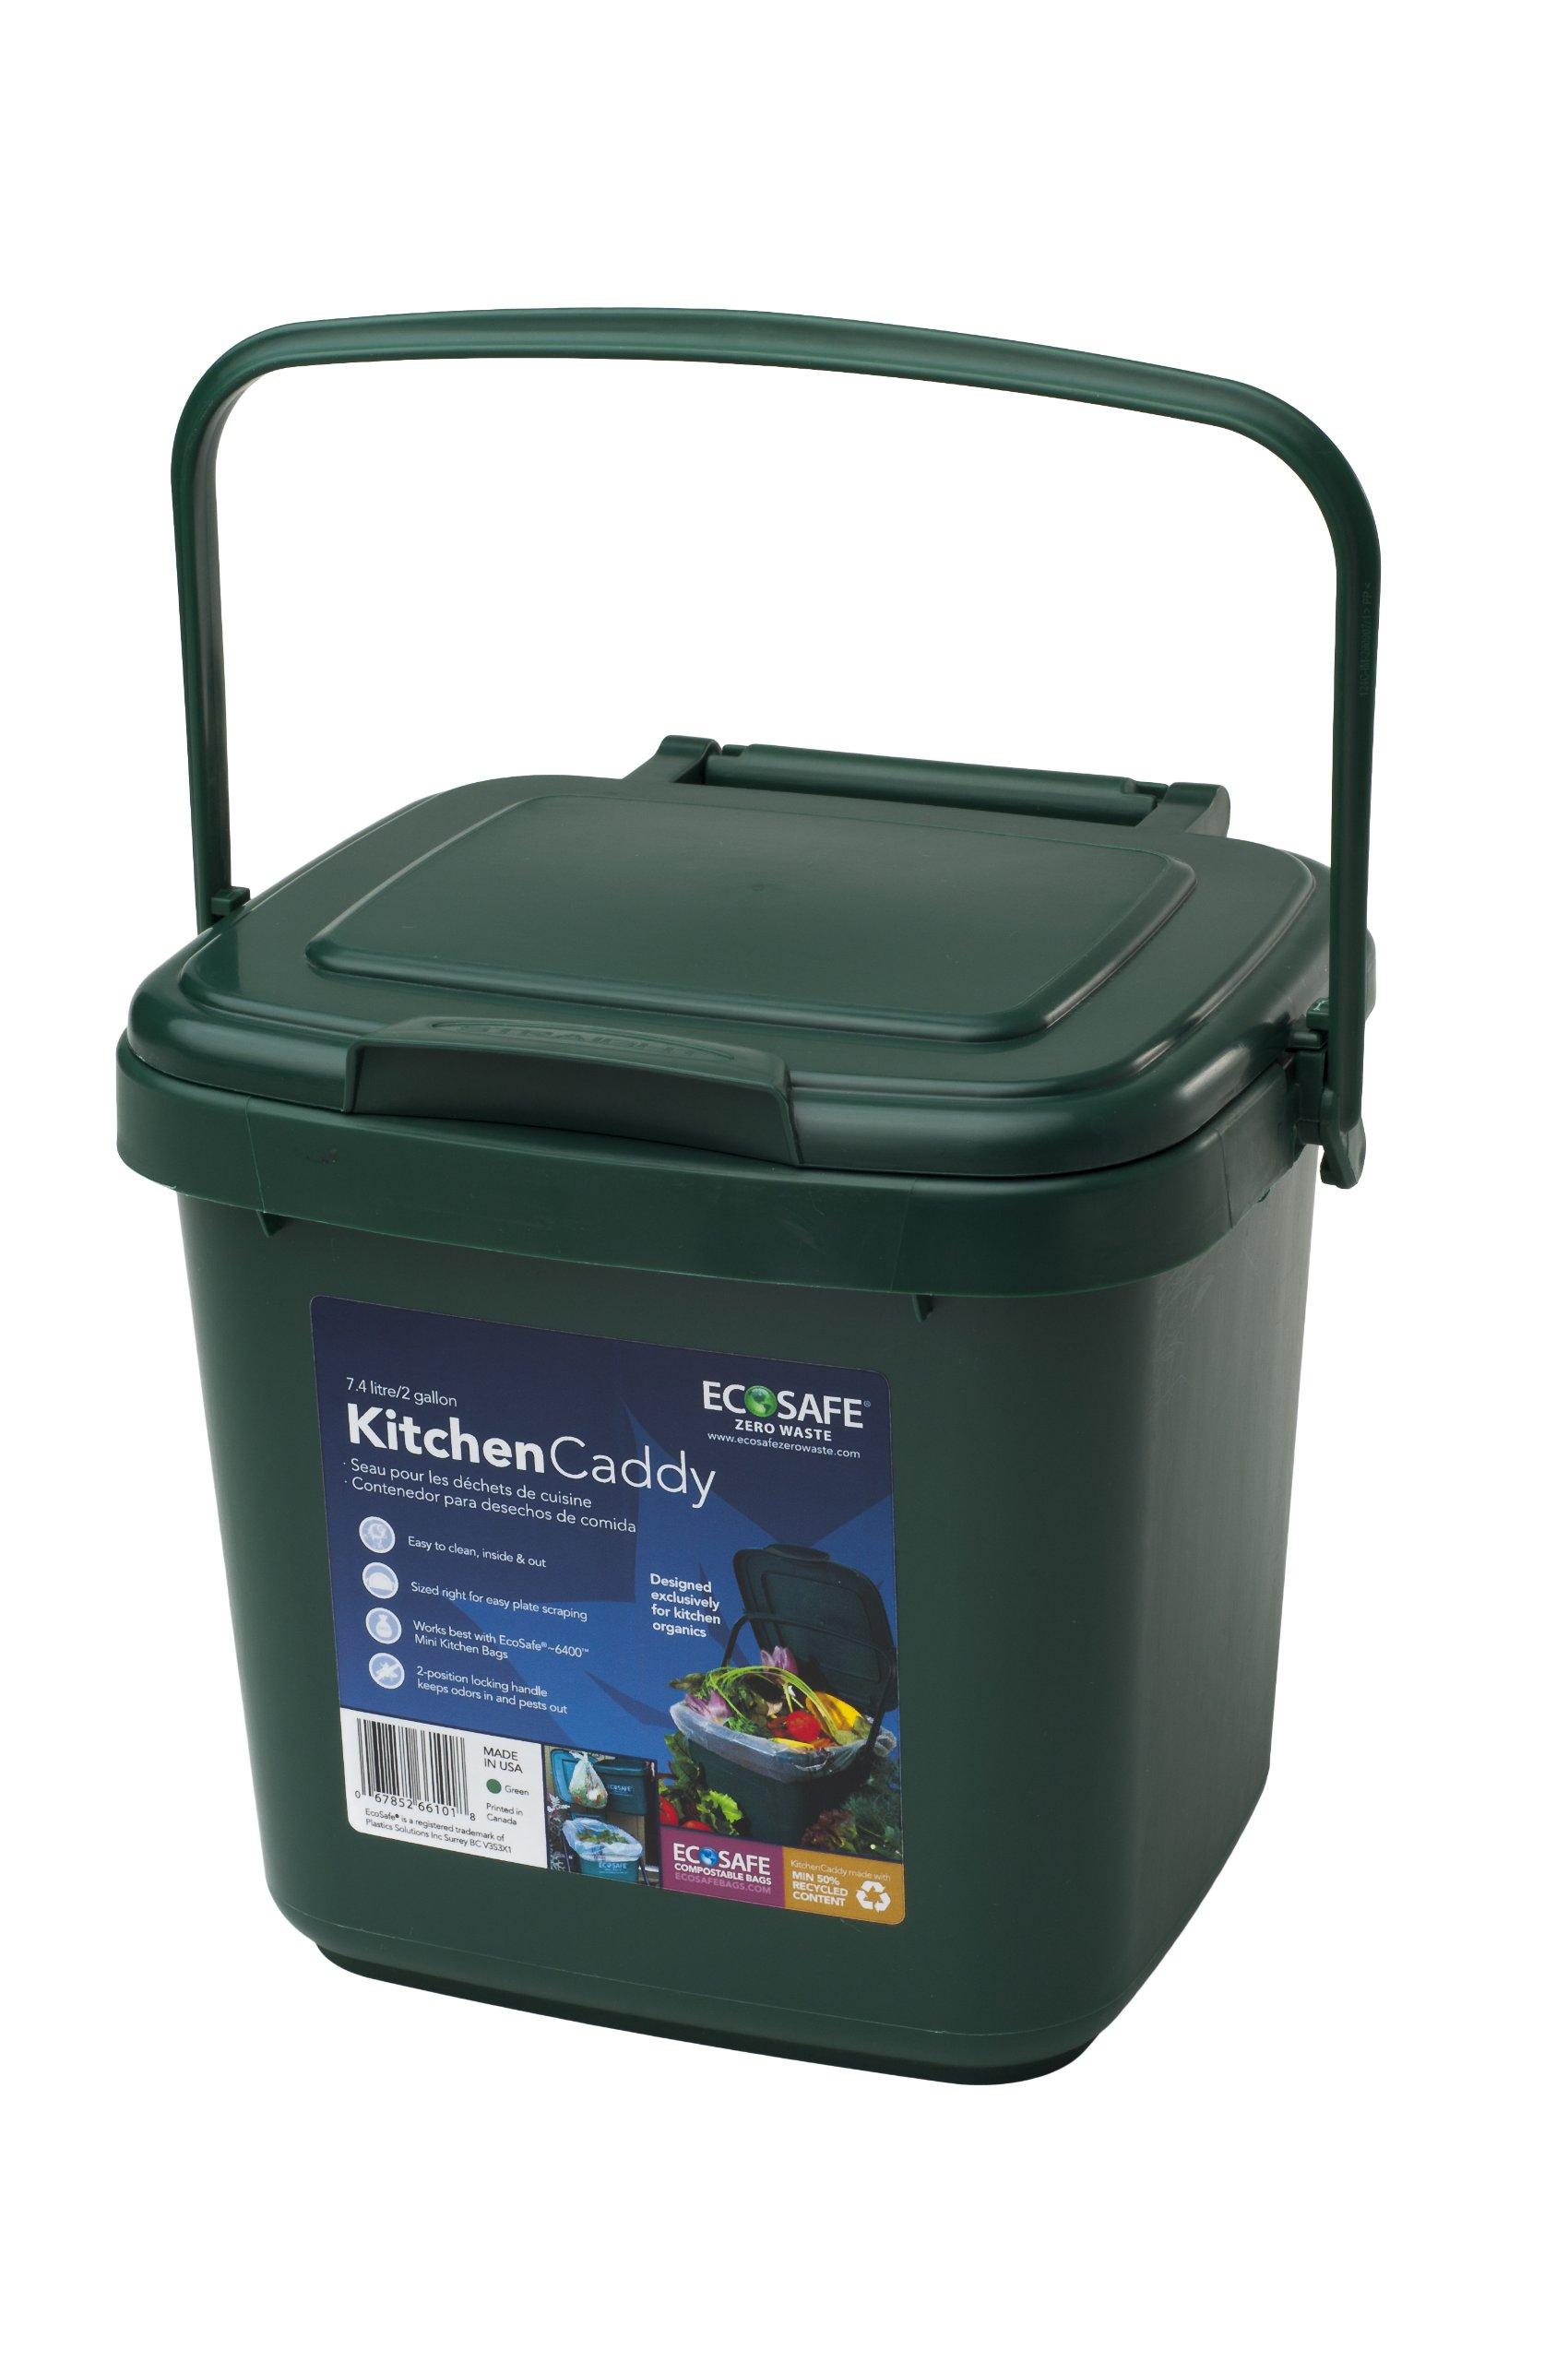 EcoSafe KCGRN Kitchen Caddy Food Waste Bin, Plastic, 2 gallon, Green